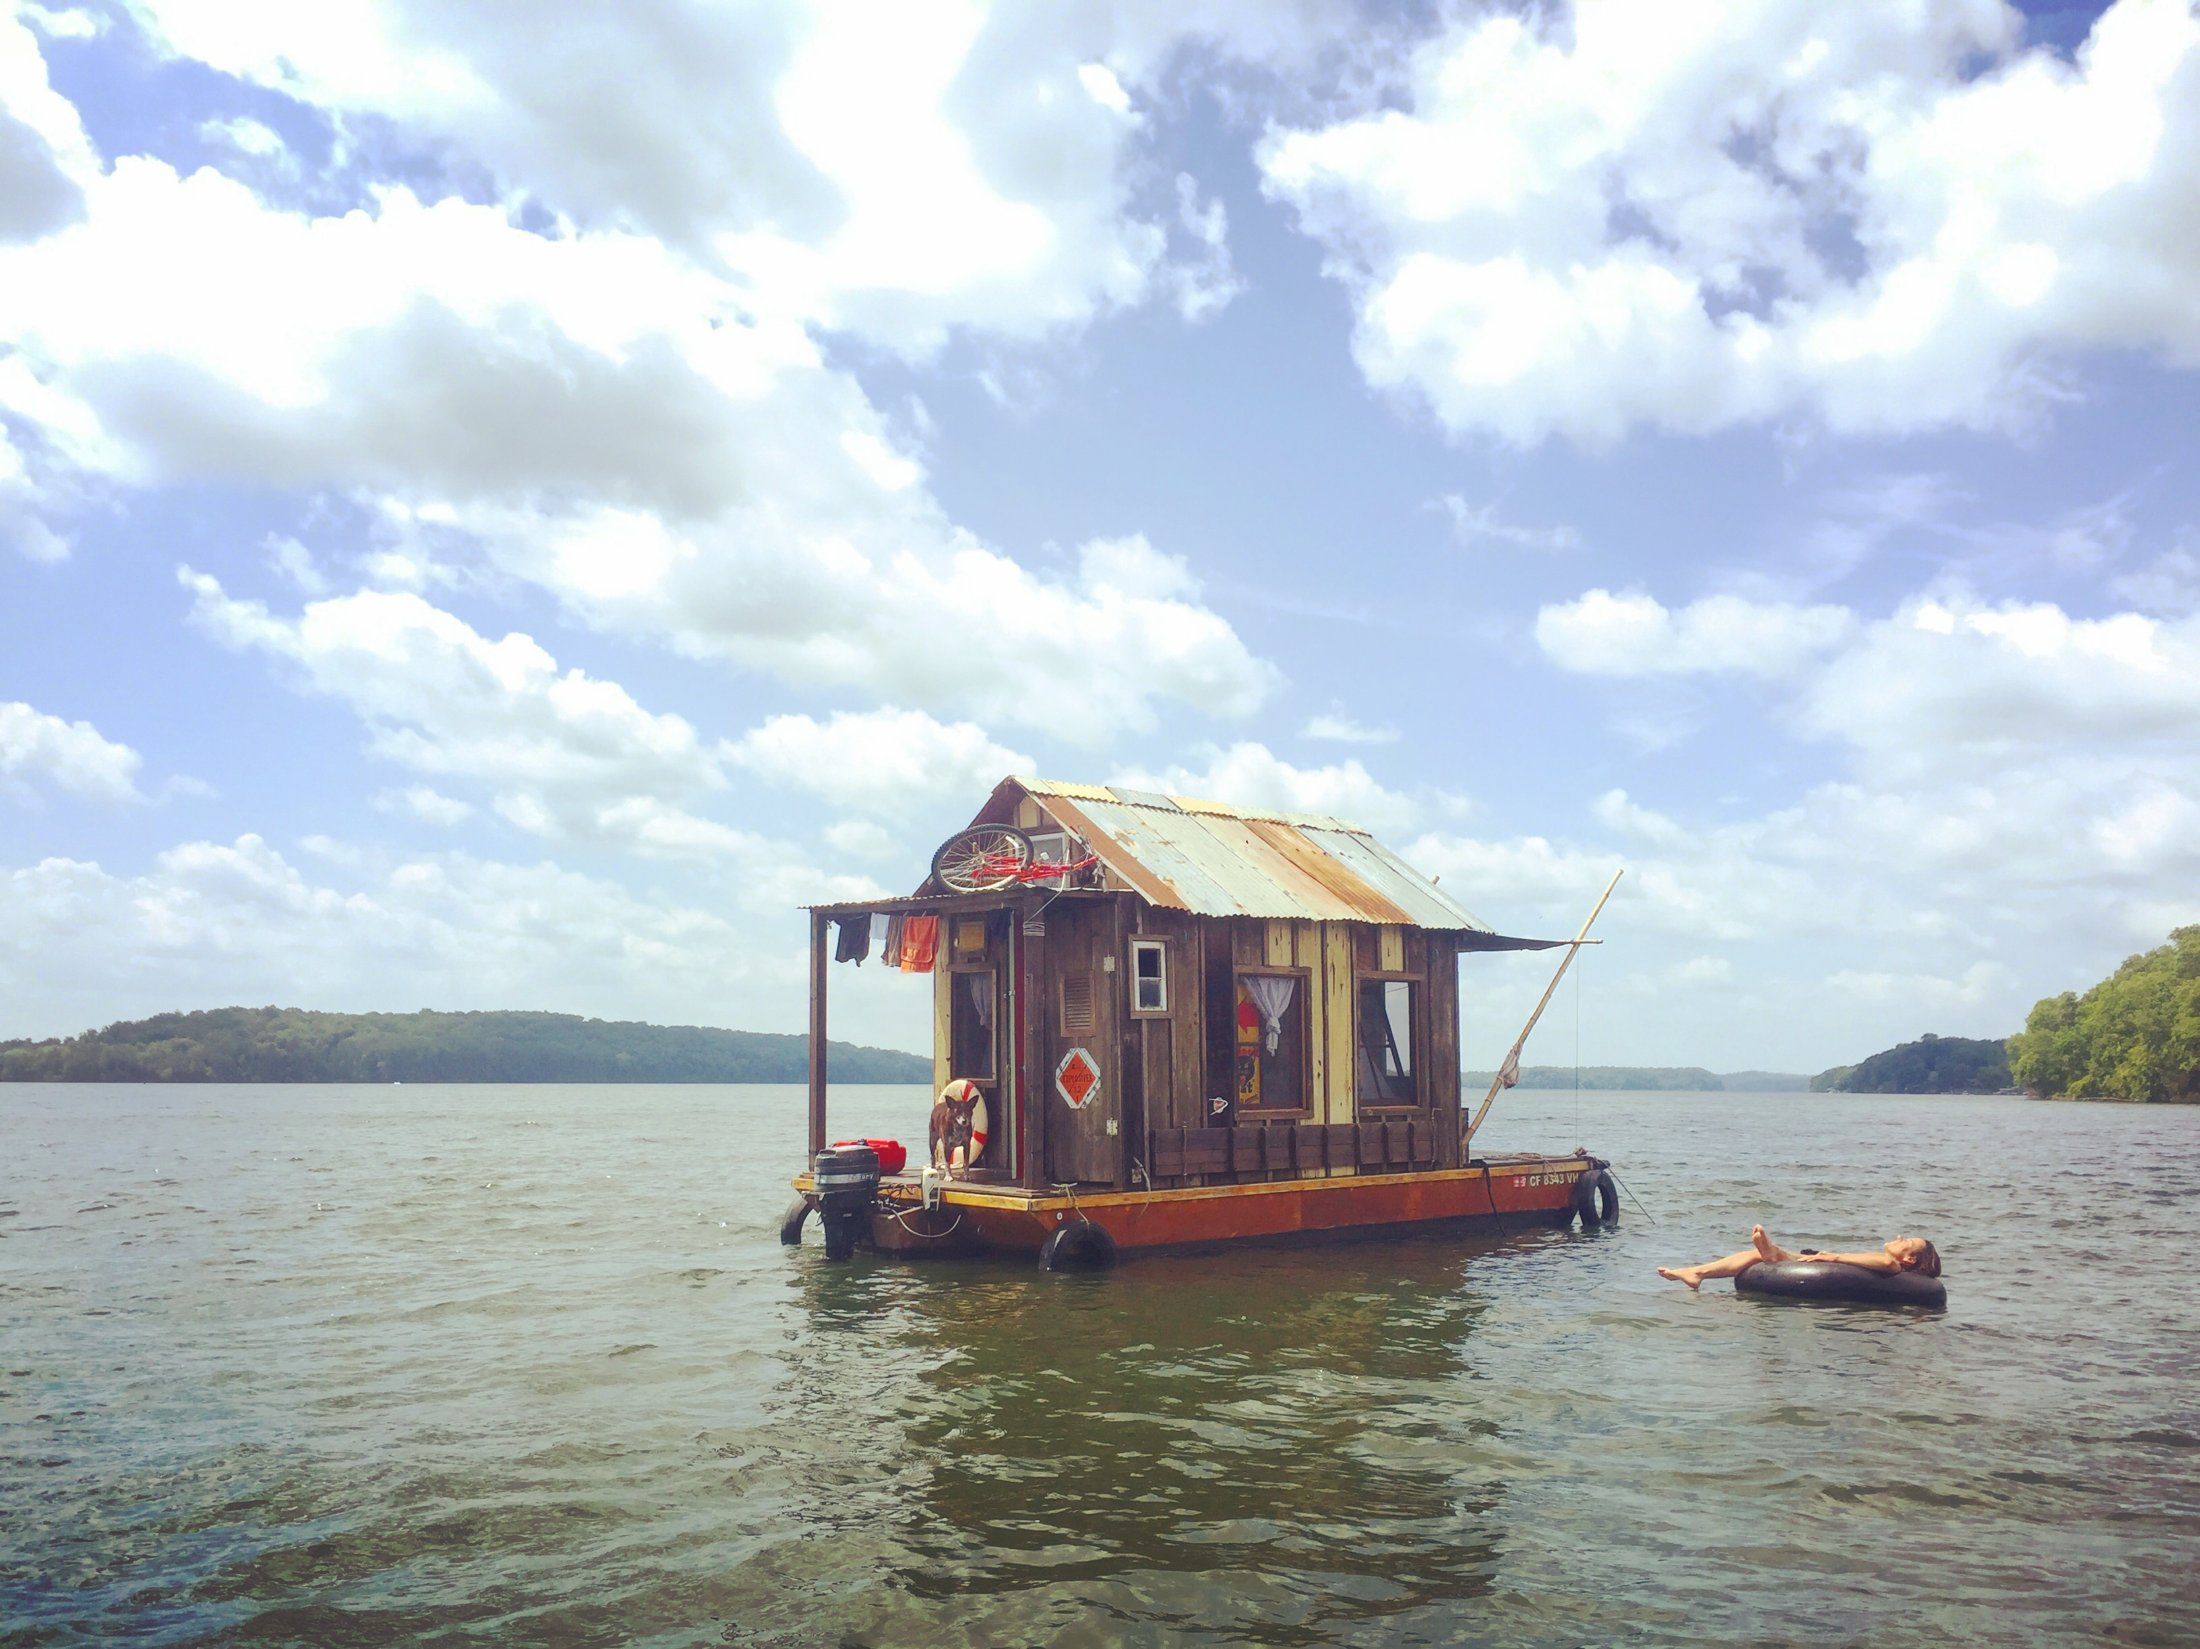 The shantyboat Dotty